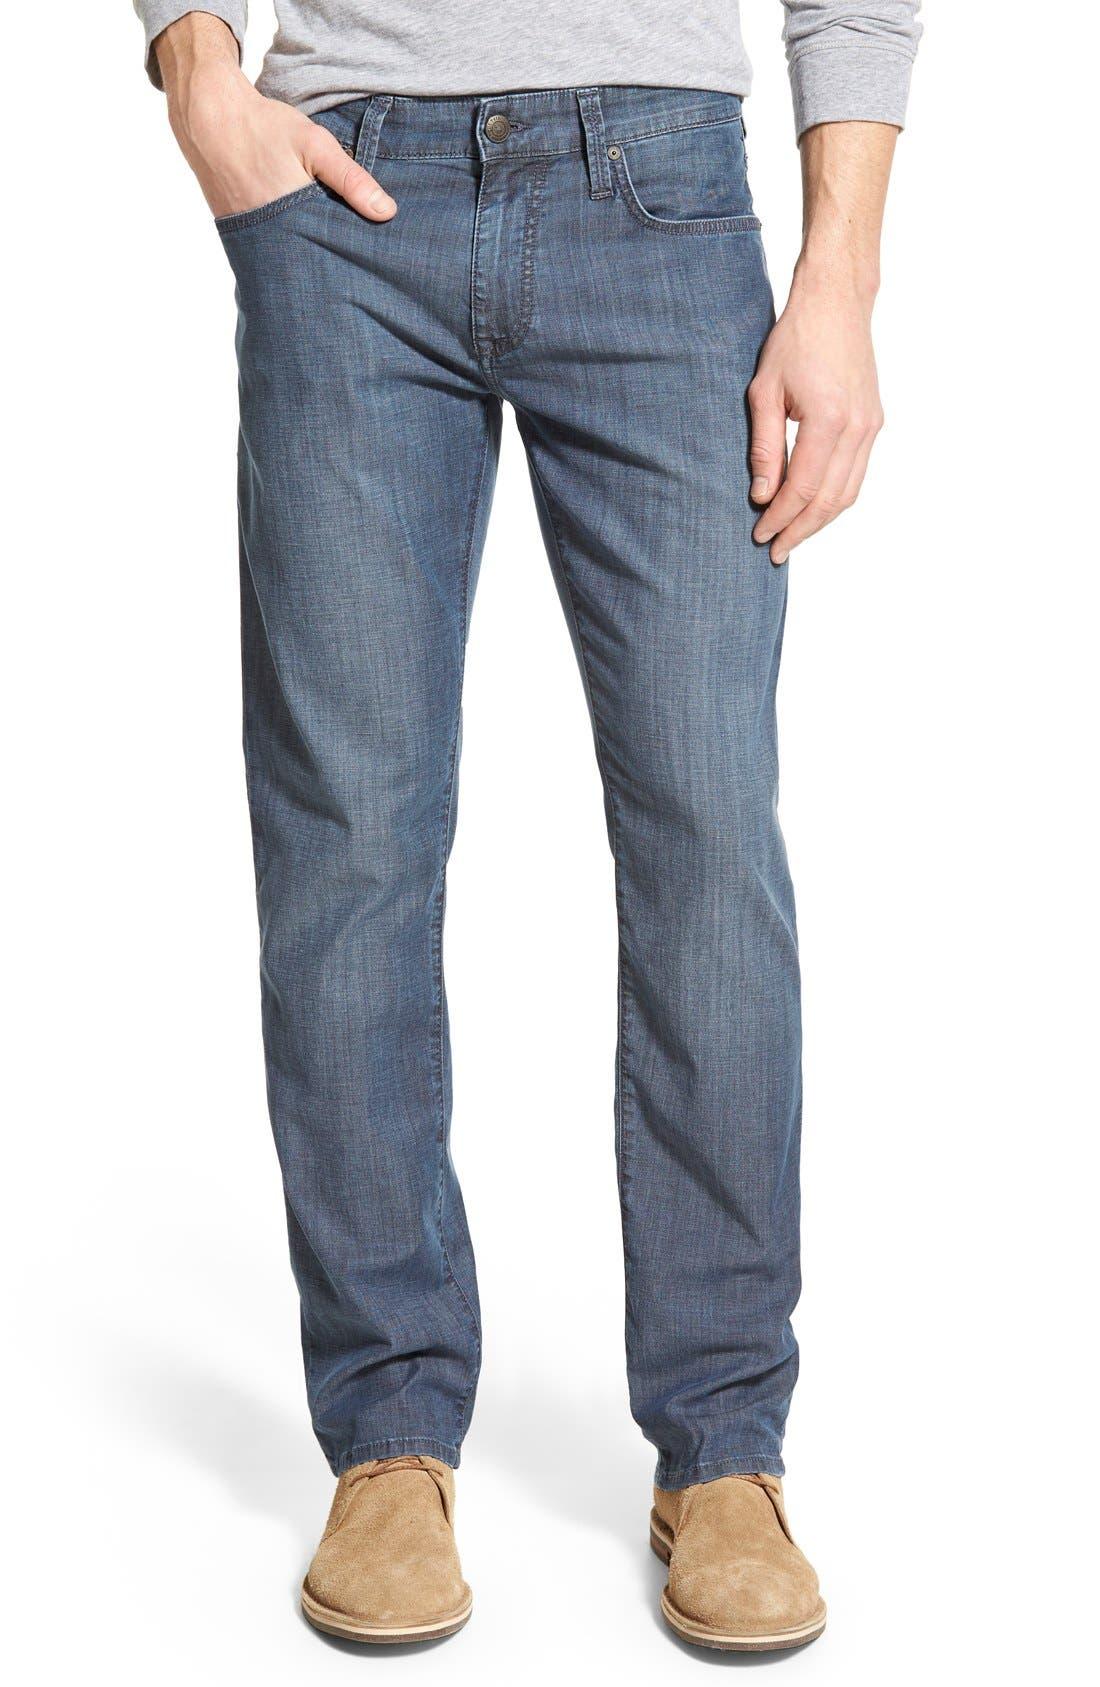 Main Image - Mavi Jeans 'Zach' Straight Leg Jeans (Chambray) (Regular & Tall)